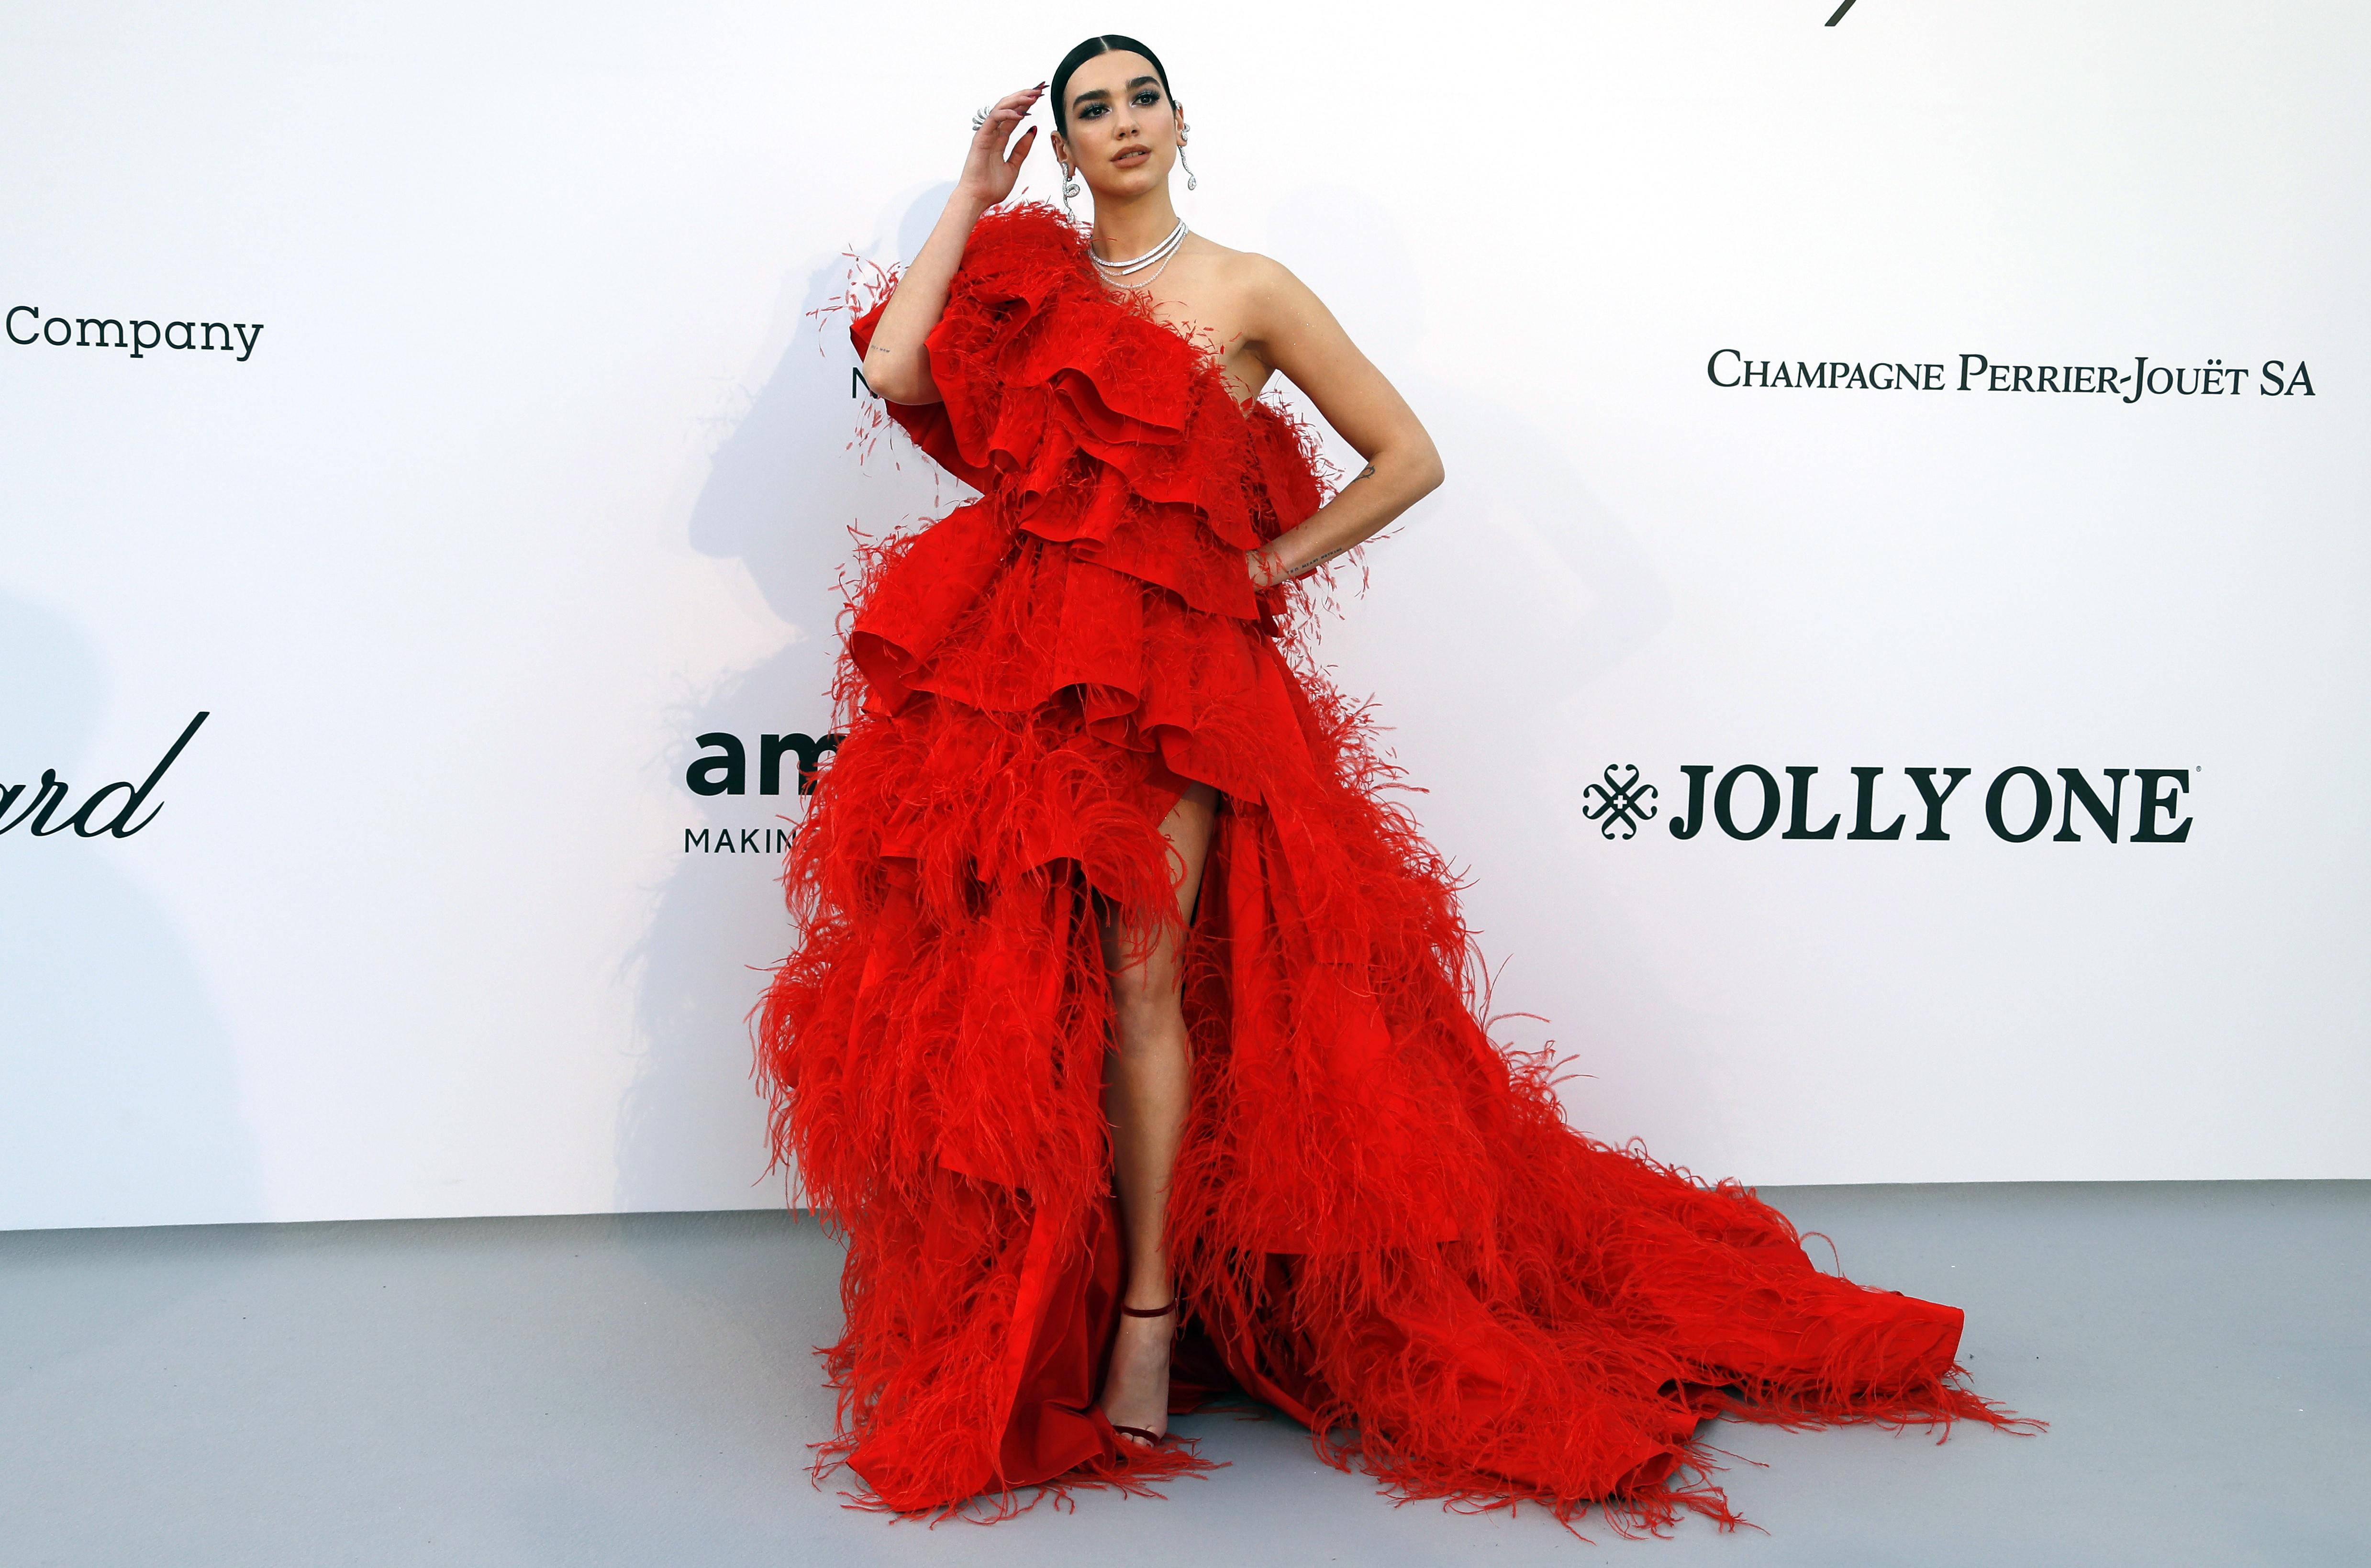 Tom Jones, Pamela Anderson crank up the glamor at Cannes fundraiser for AIDS